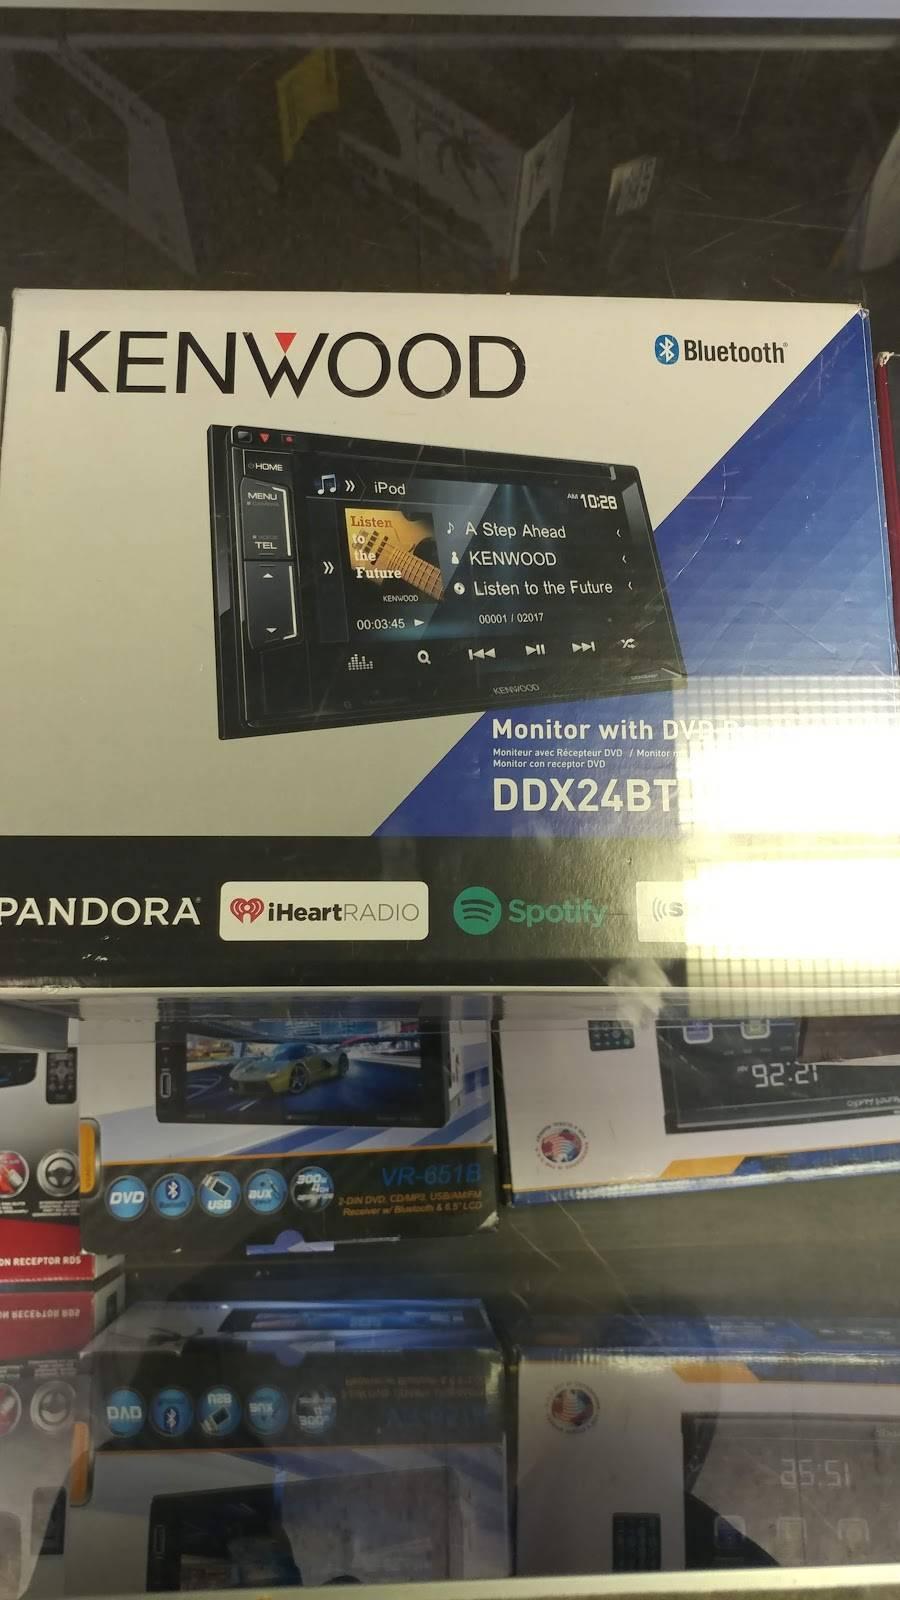 Nuñez Audio - electronics store  | Photo 6 of 9 | Address: 3330 N 35th Ave #2, Phoenix, AZ 85017, USA | Phone: (602) 635-8182